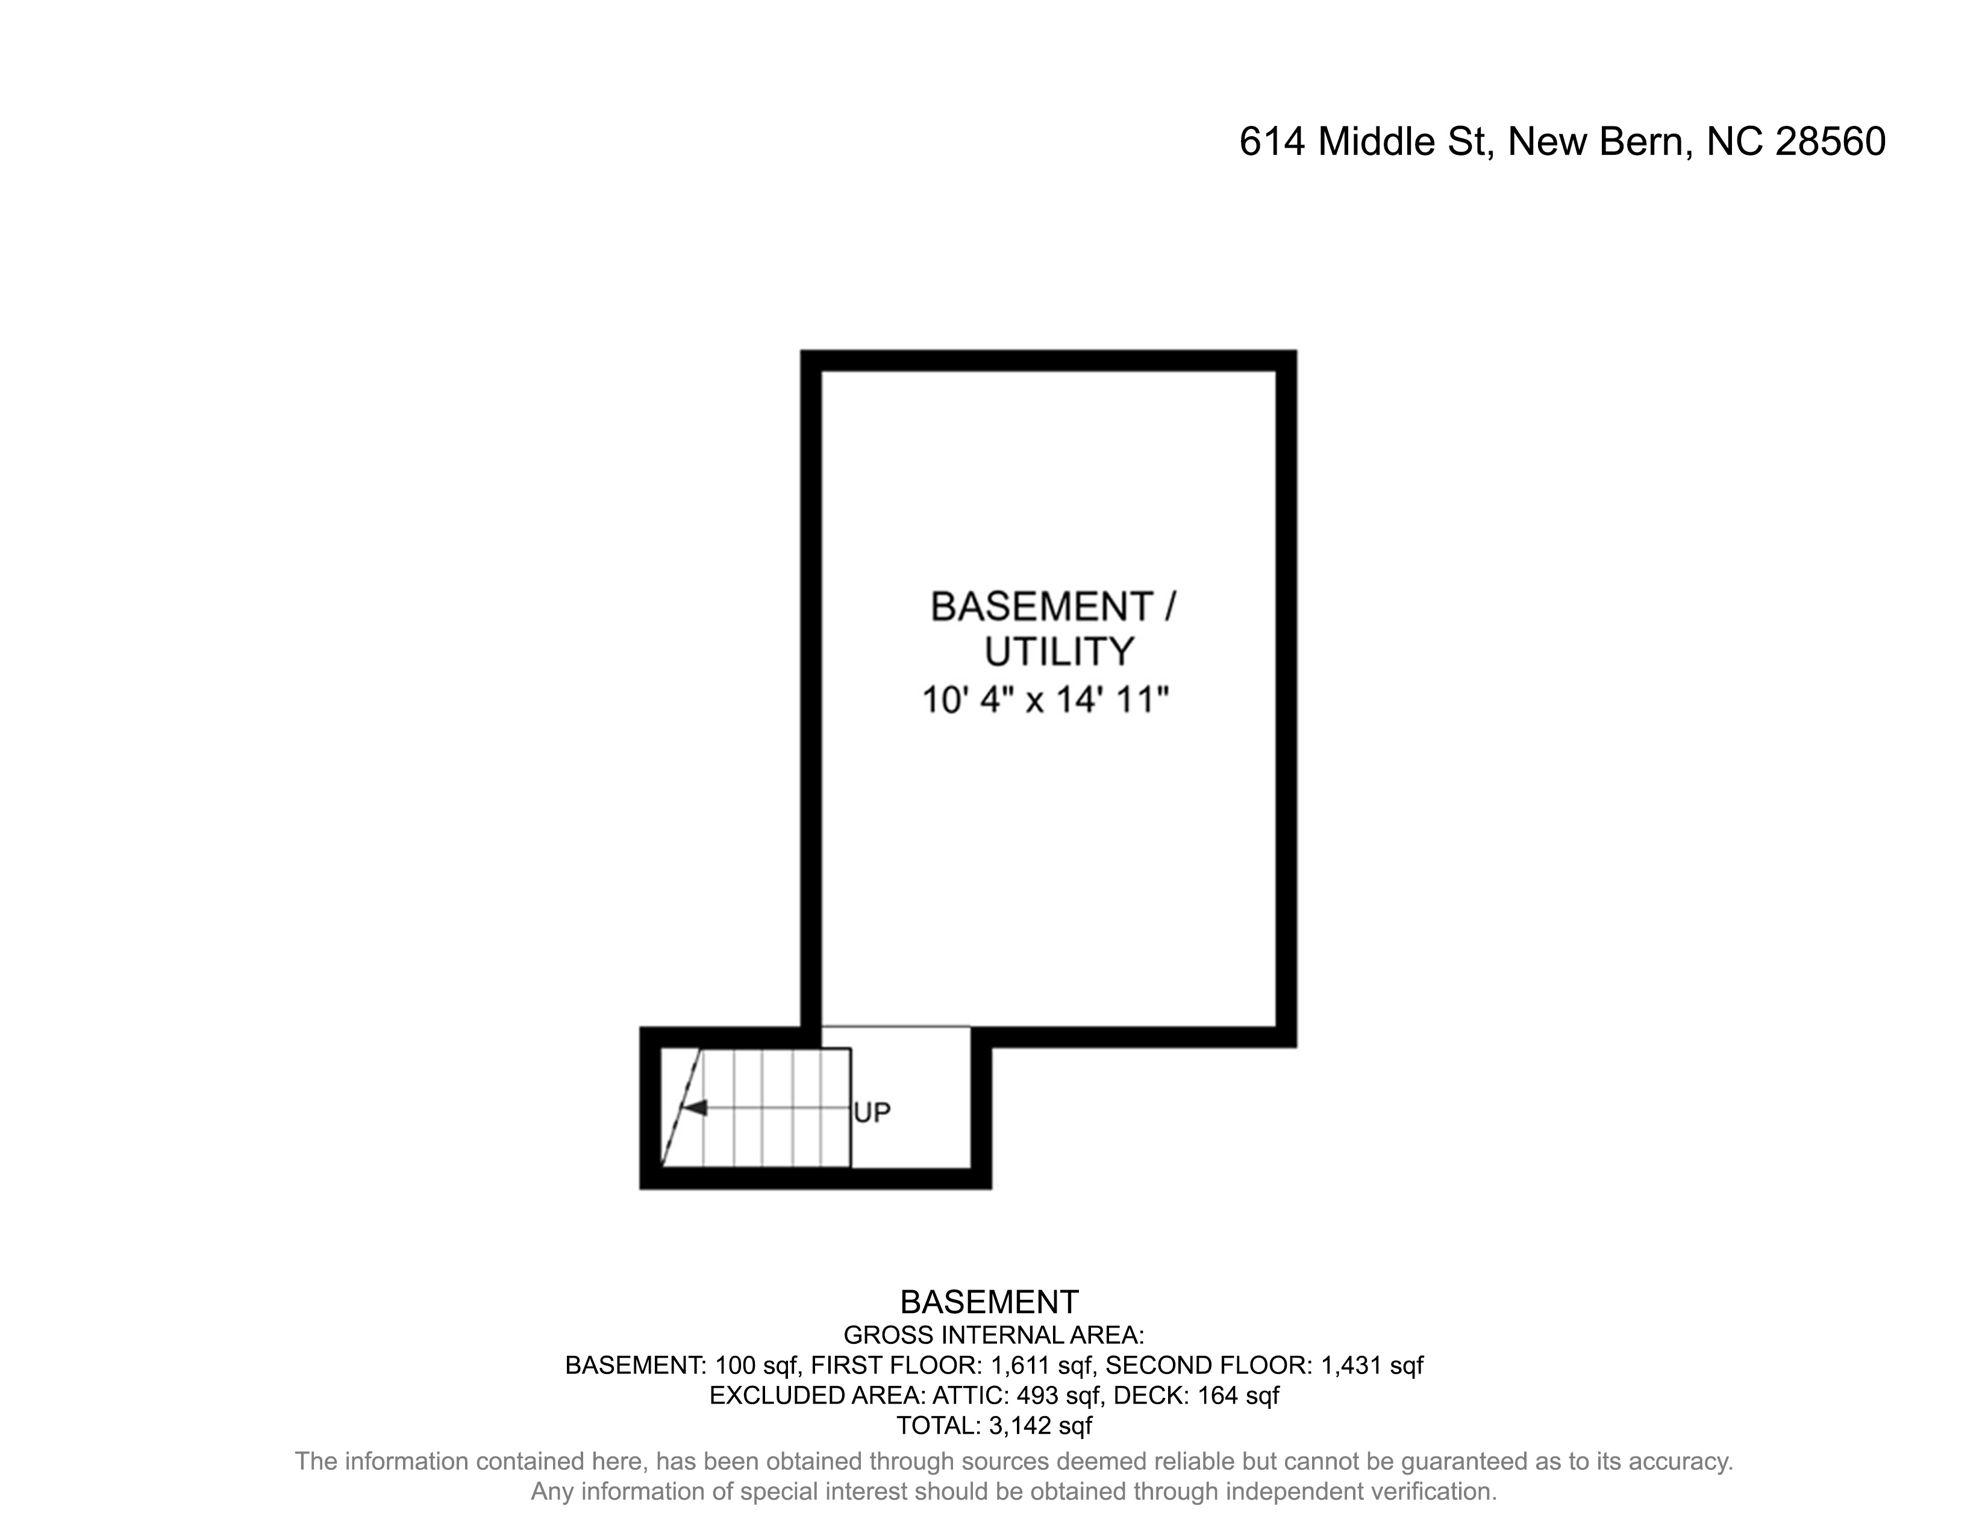 Floorplan #1